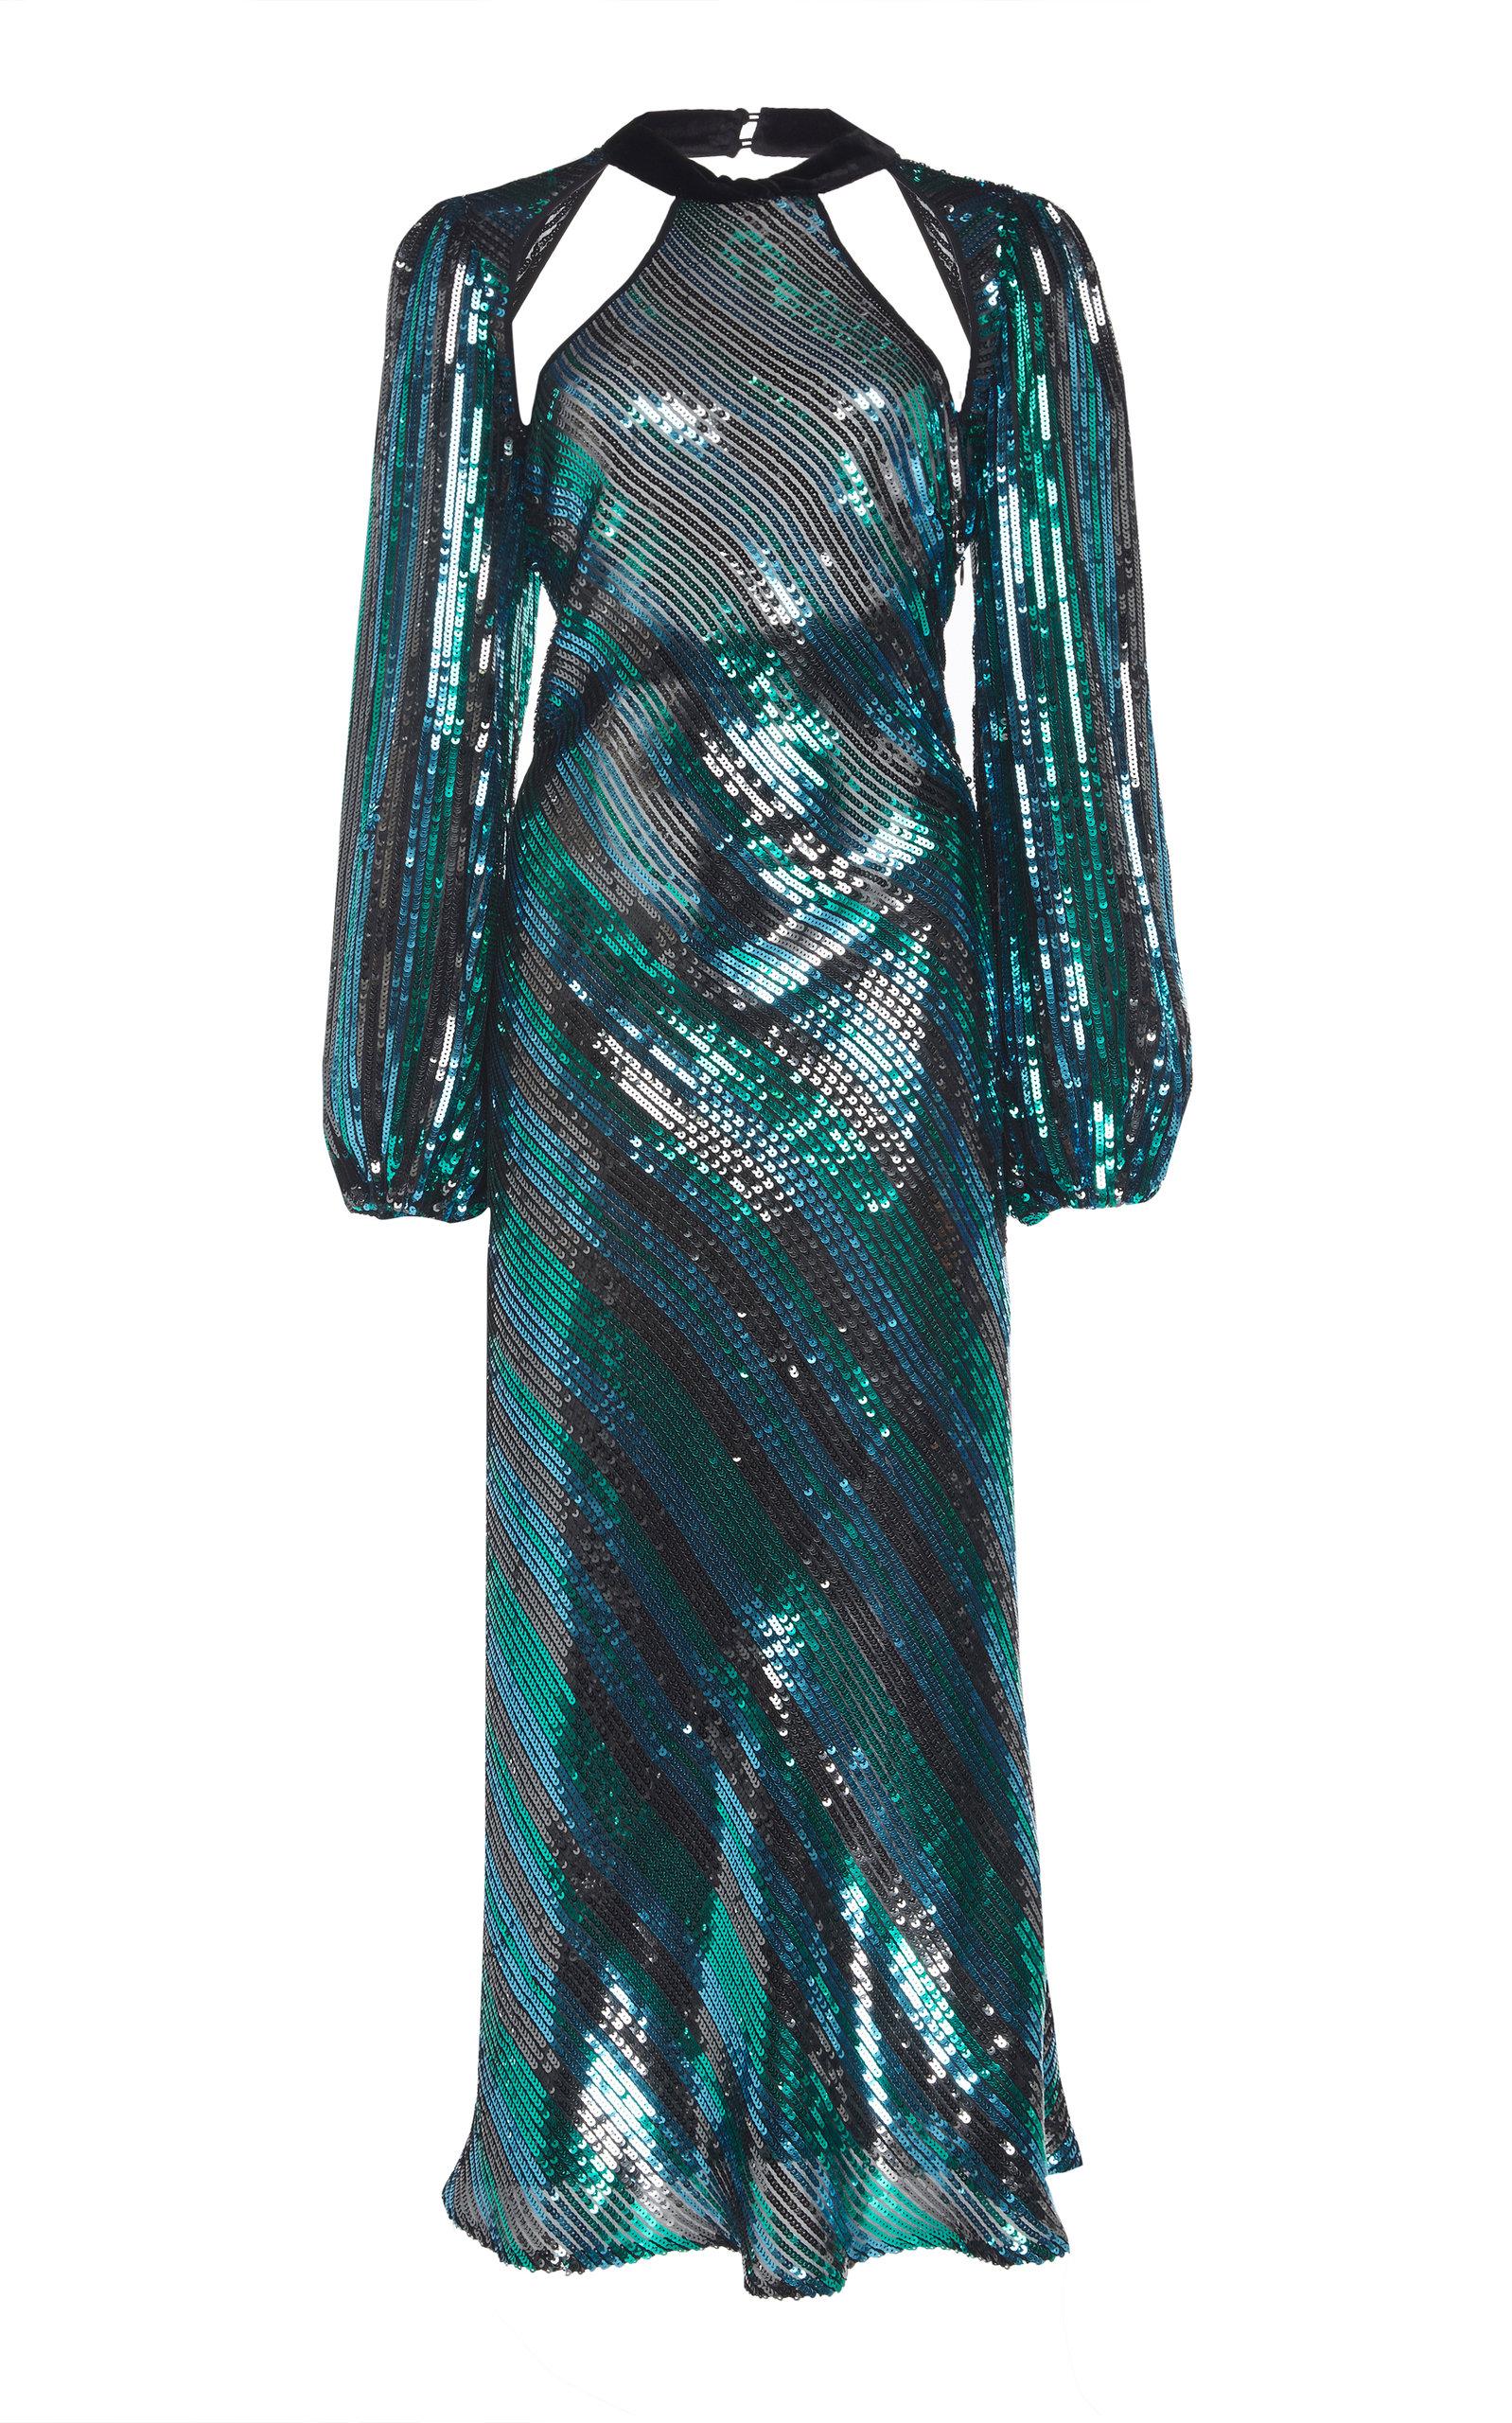 Rixo London CELIA CUTOUT SEQUINED CHIFFON MAXI DRESS SIZE: L